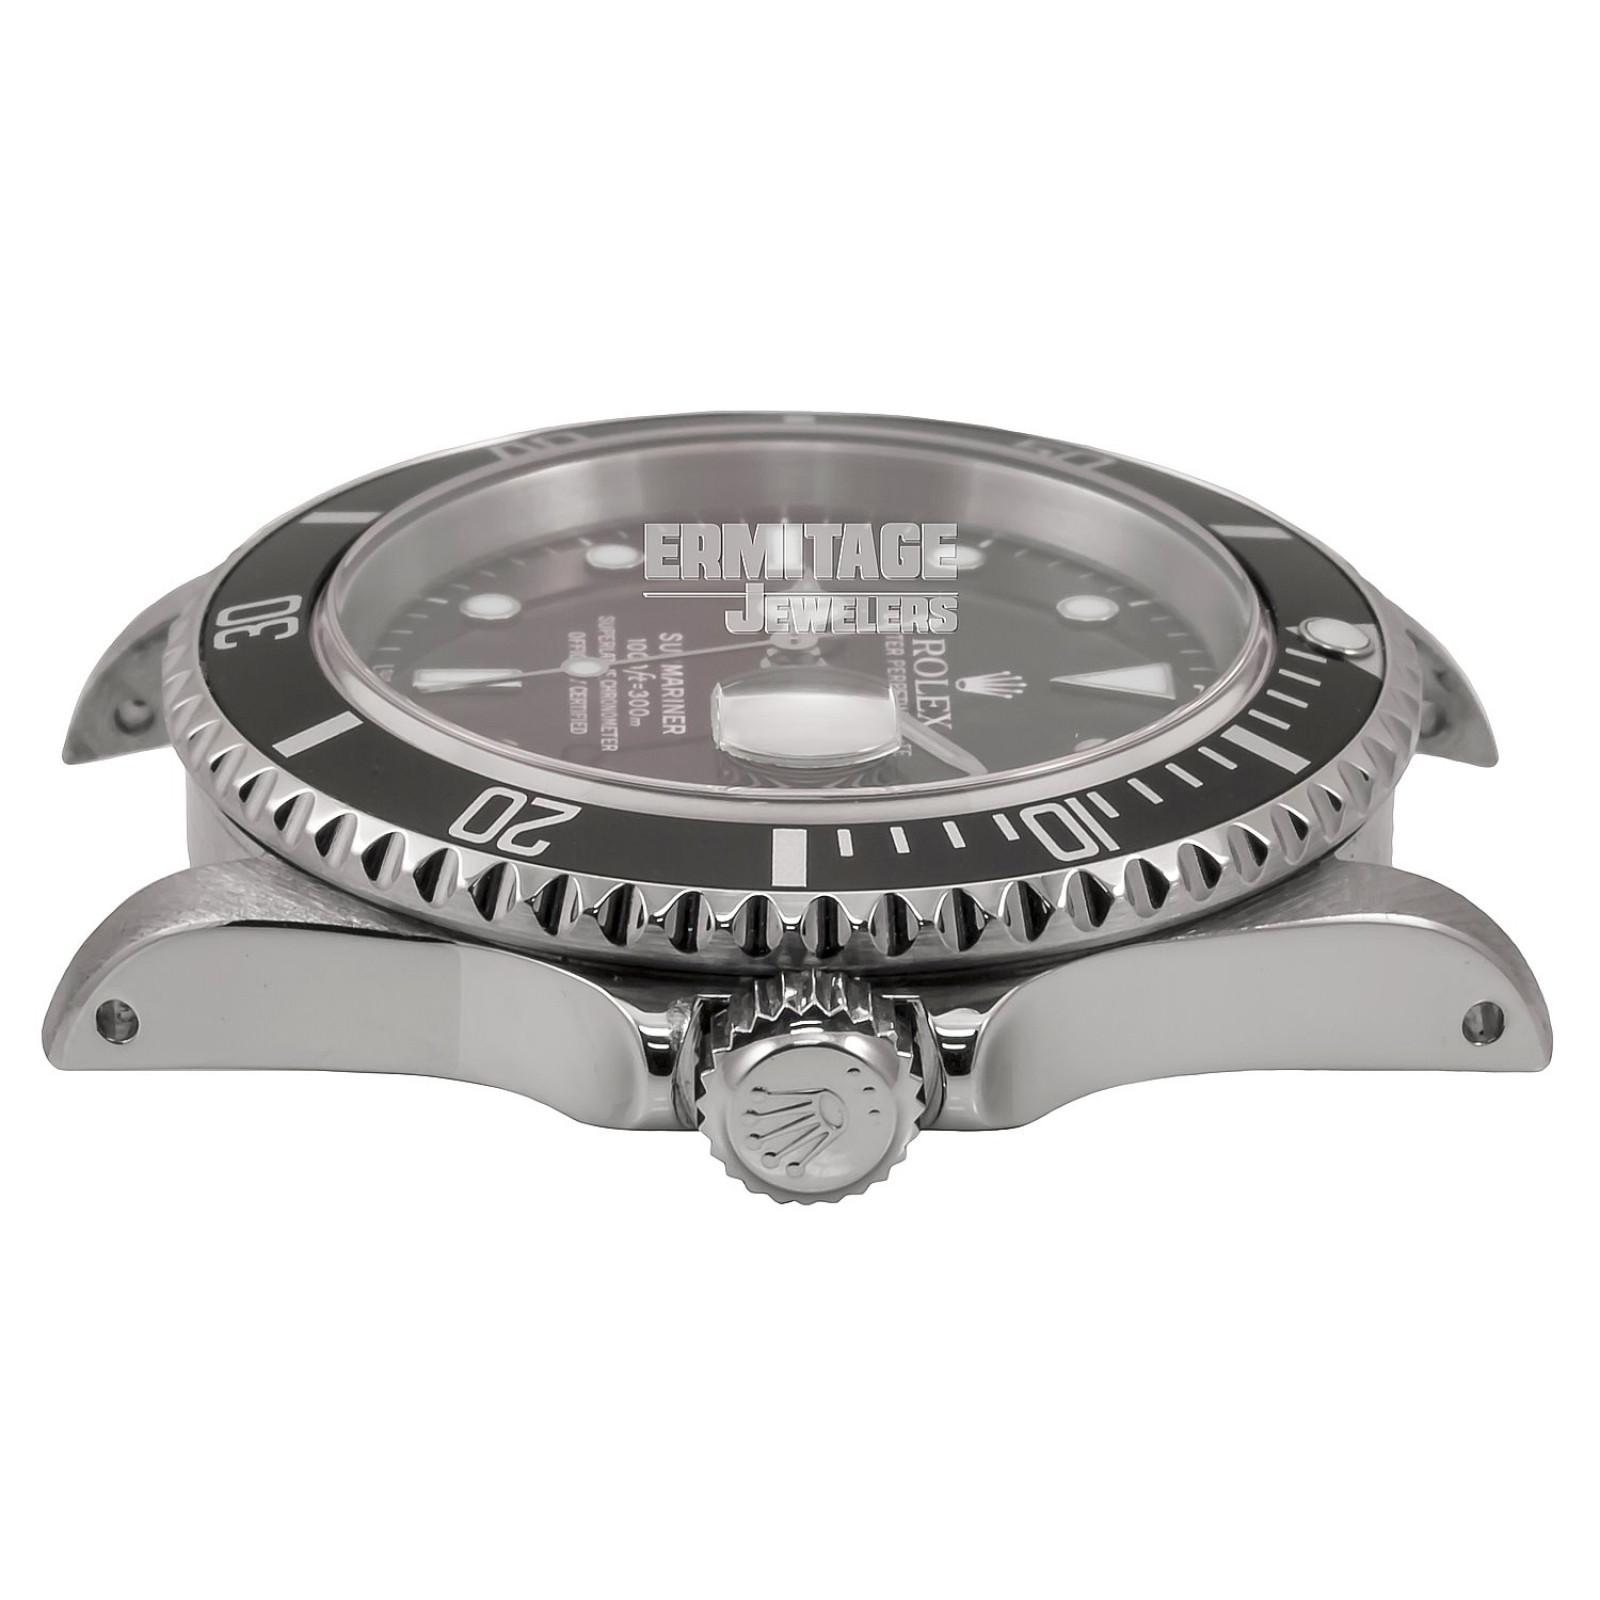 Rolex Submariner 16610 Single Swiss Rare Dial